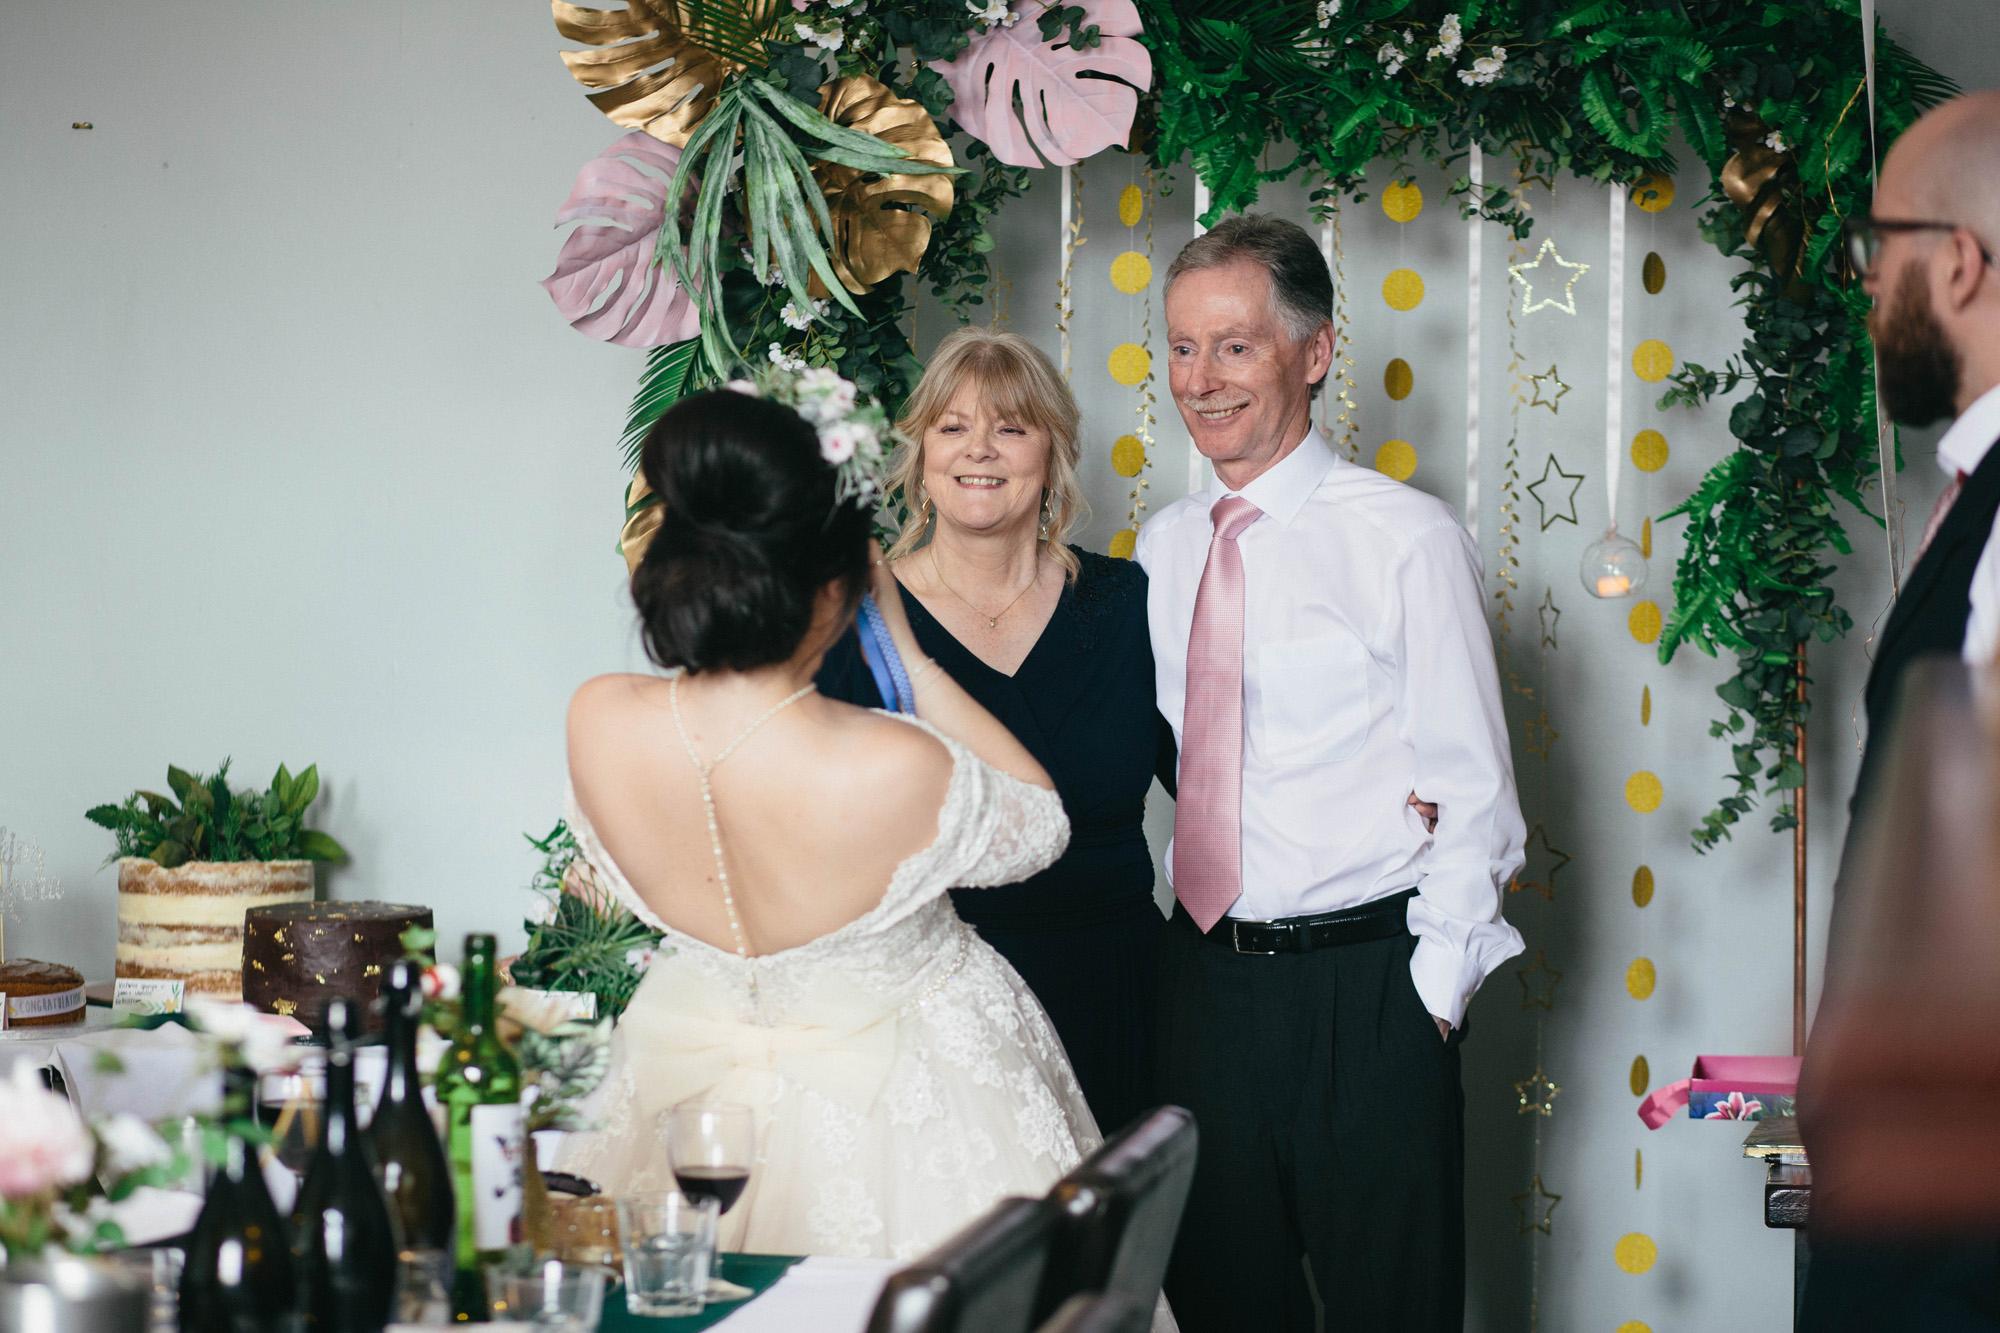 Quirky Wedding Photography Glasgow West End 050.jpg